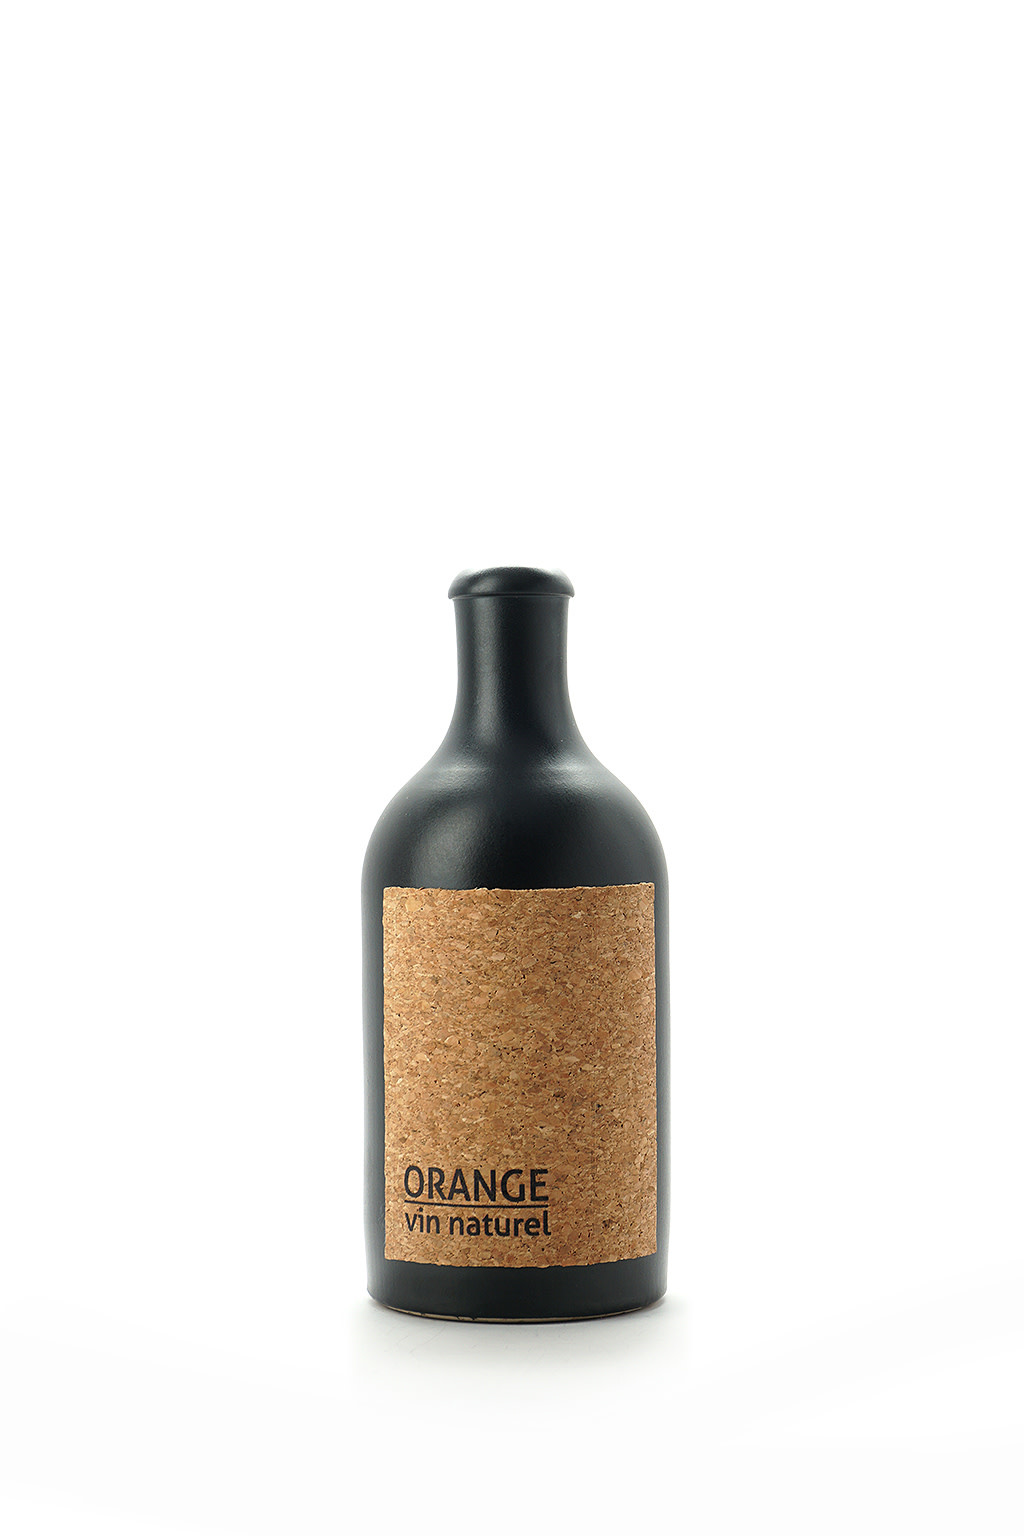 Chateau Lafitte Jurancon Orange 2018 500ml